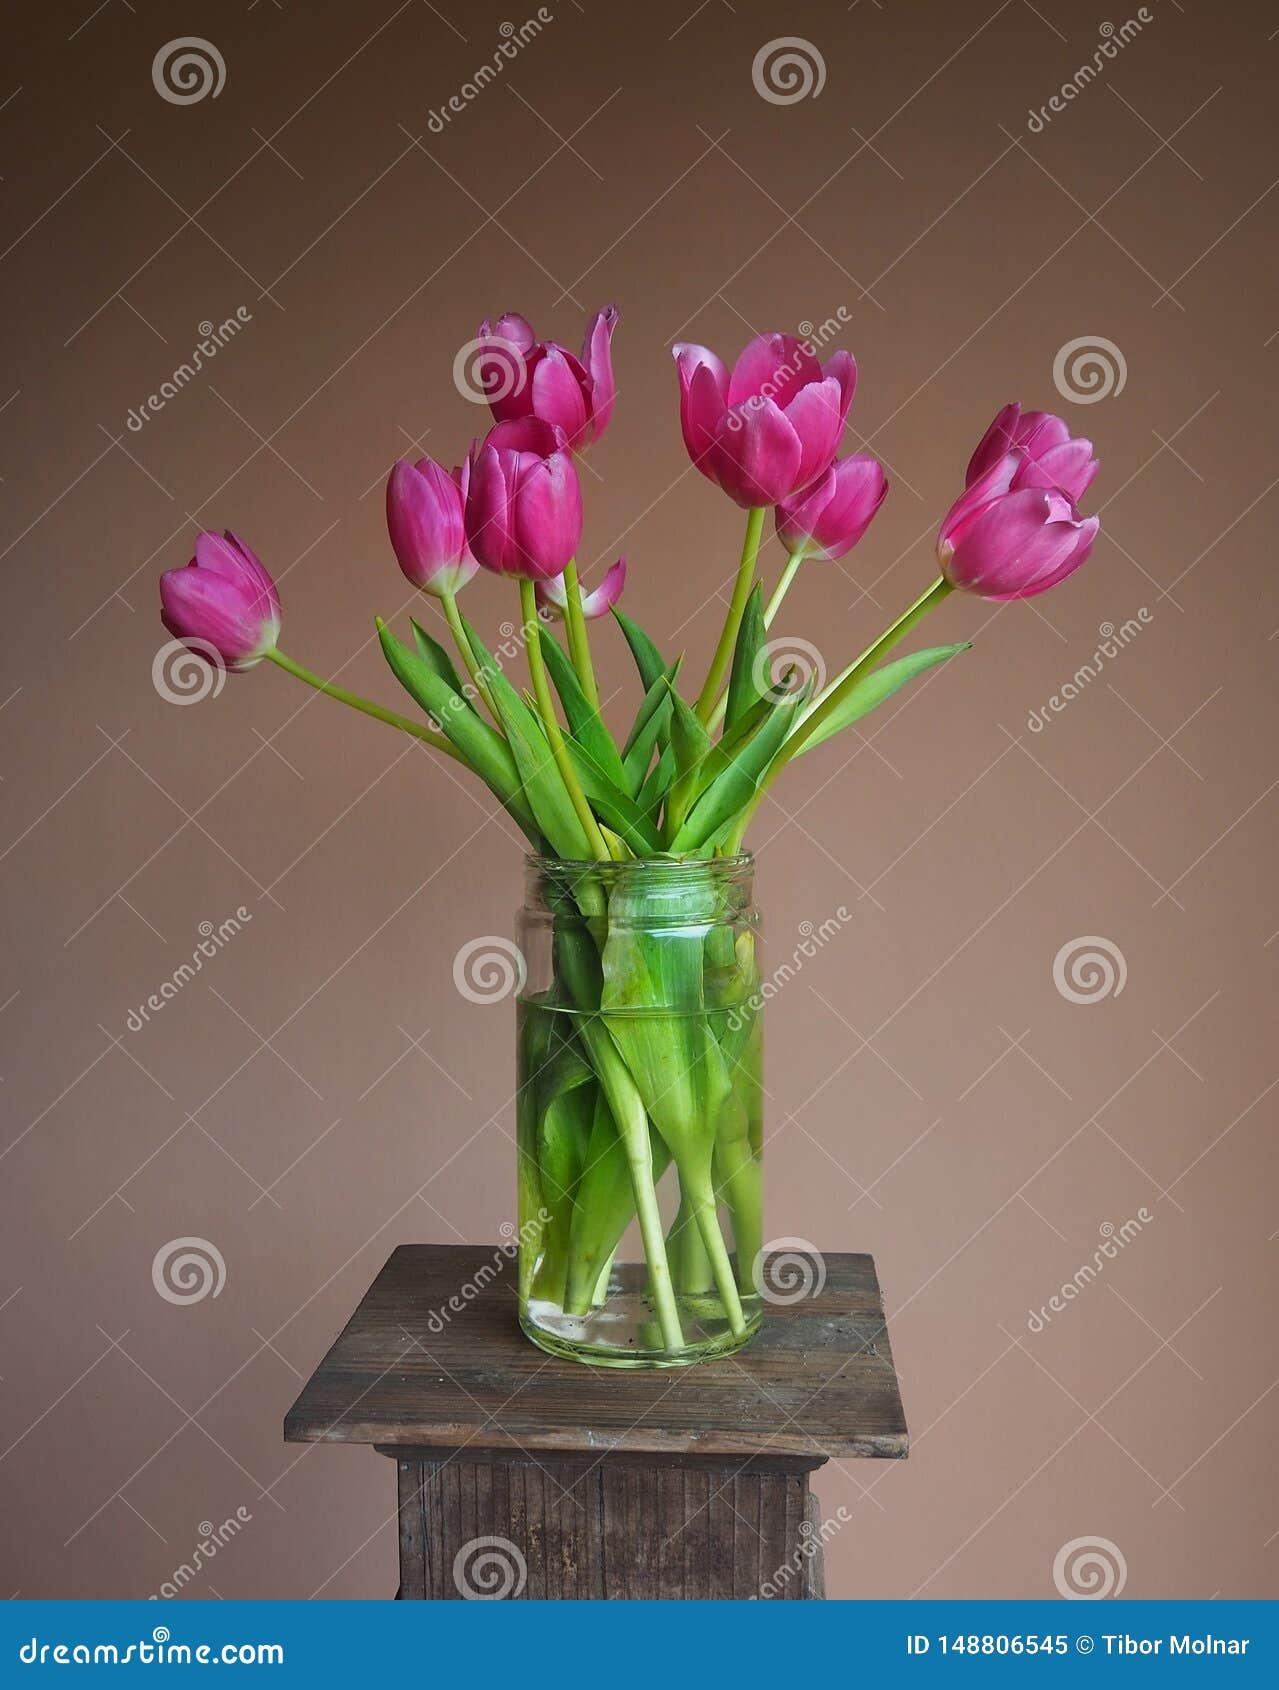 Ljus rosa tulpanbukett i en murarekrus på en sockel med terrakottabakgrund